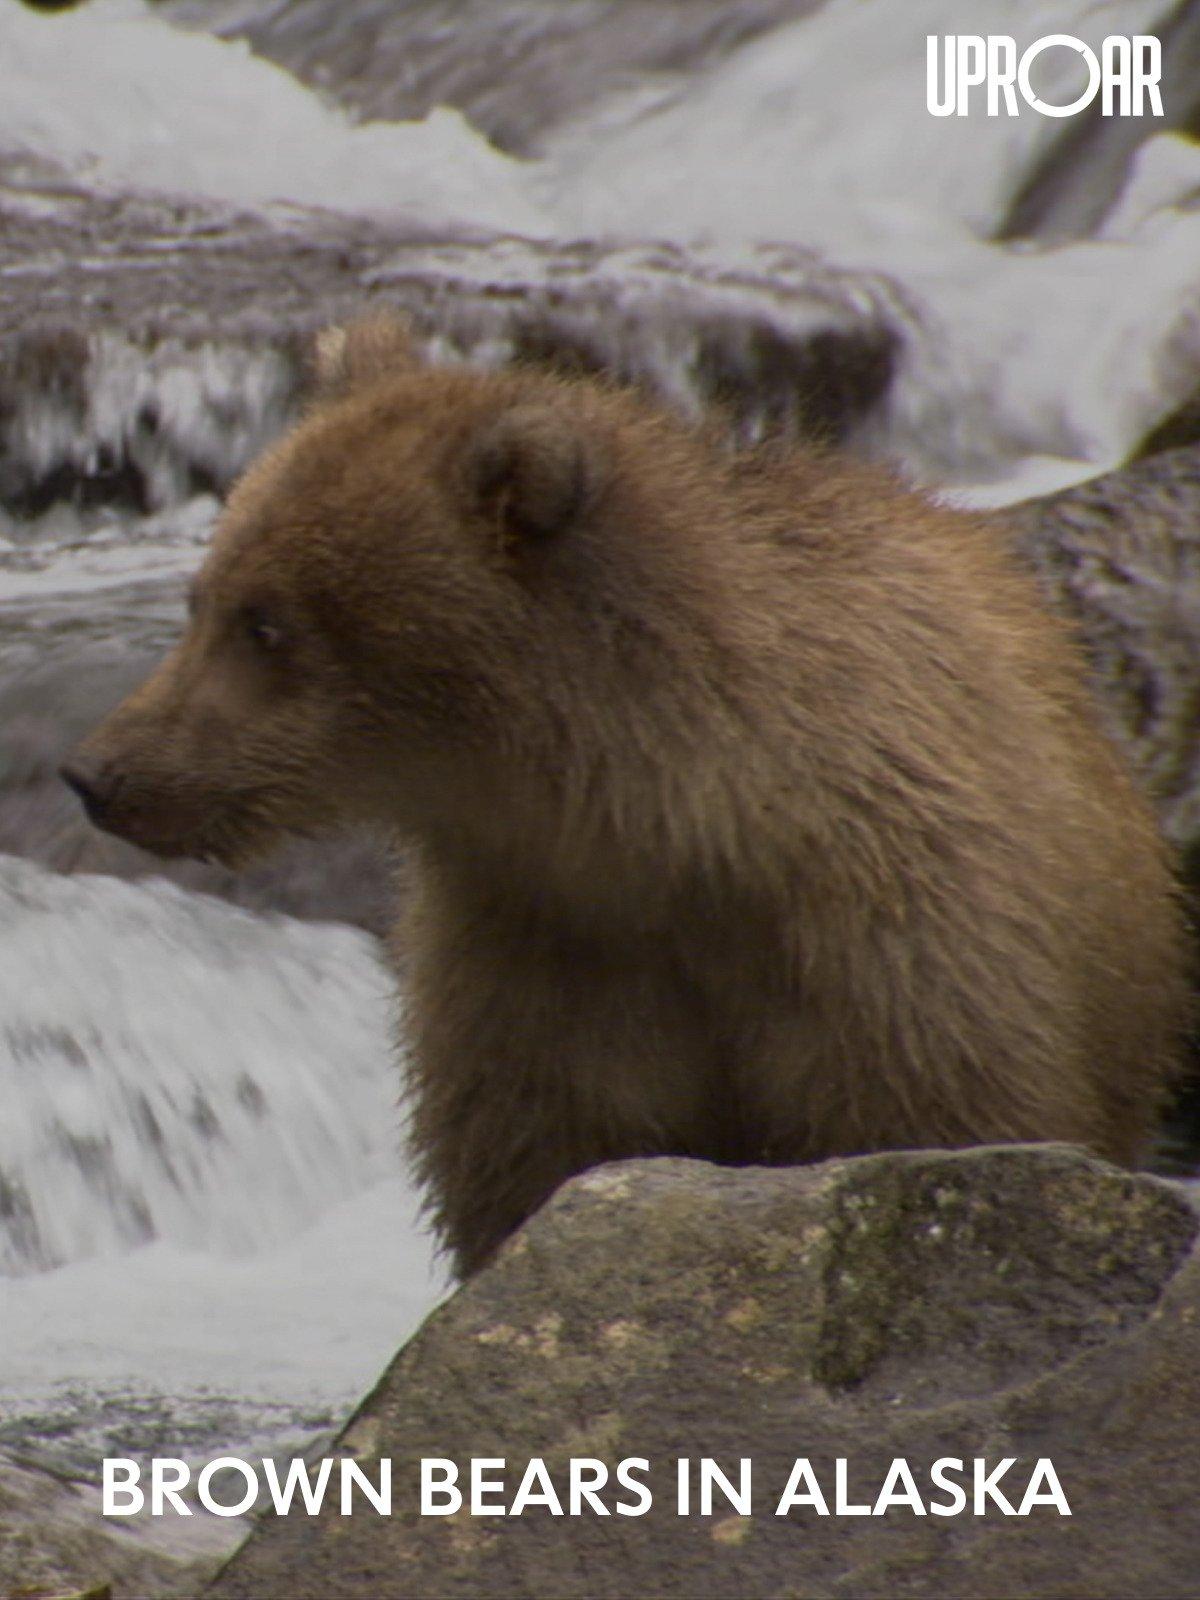 Clip: Brown Bears in Alaska